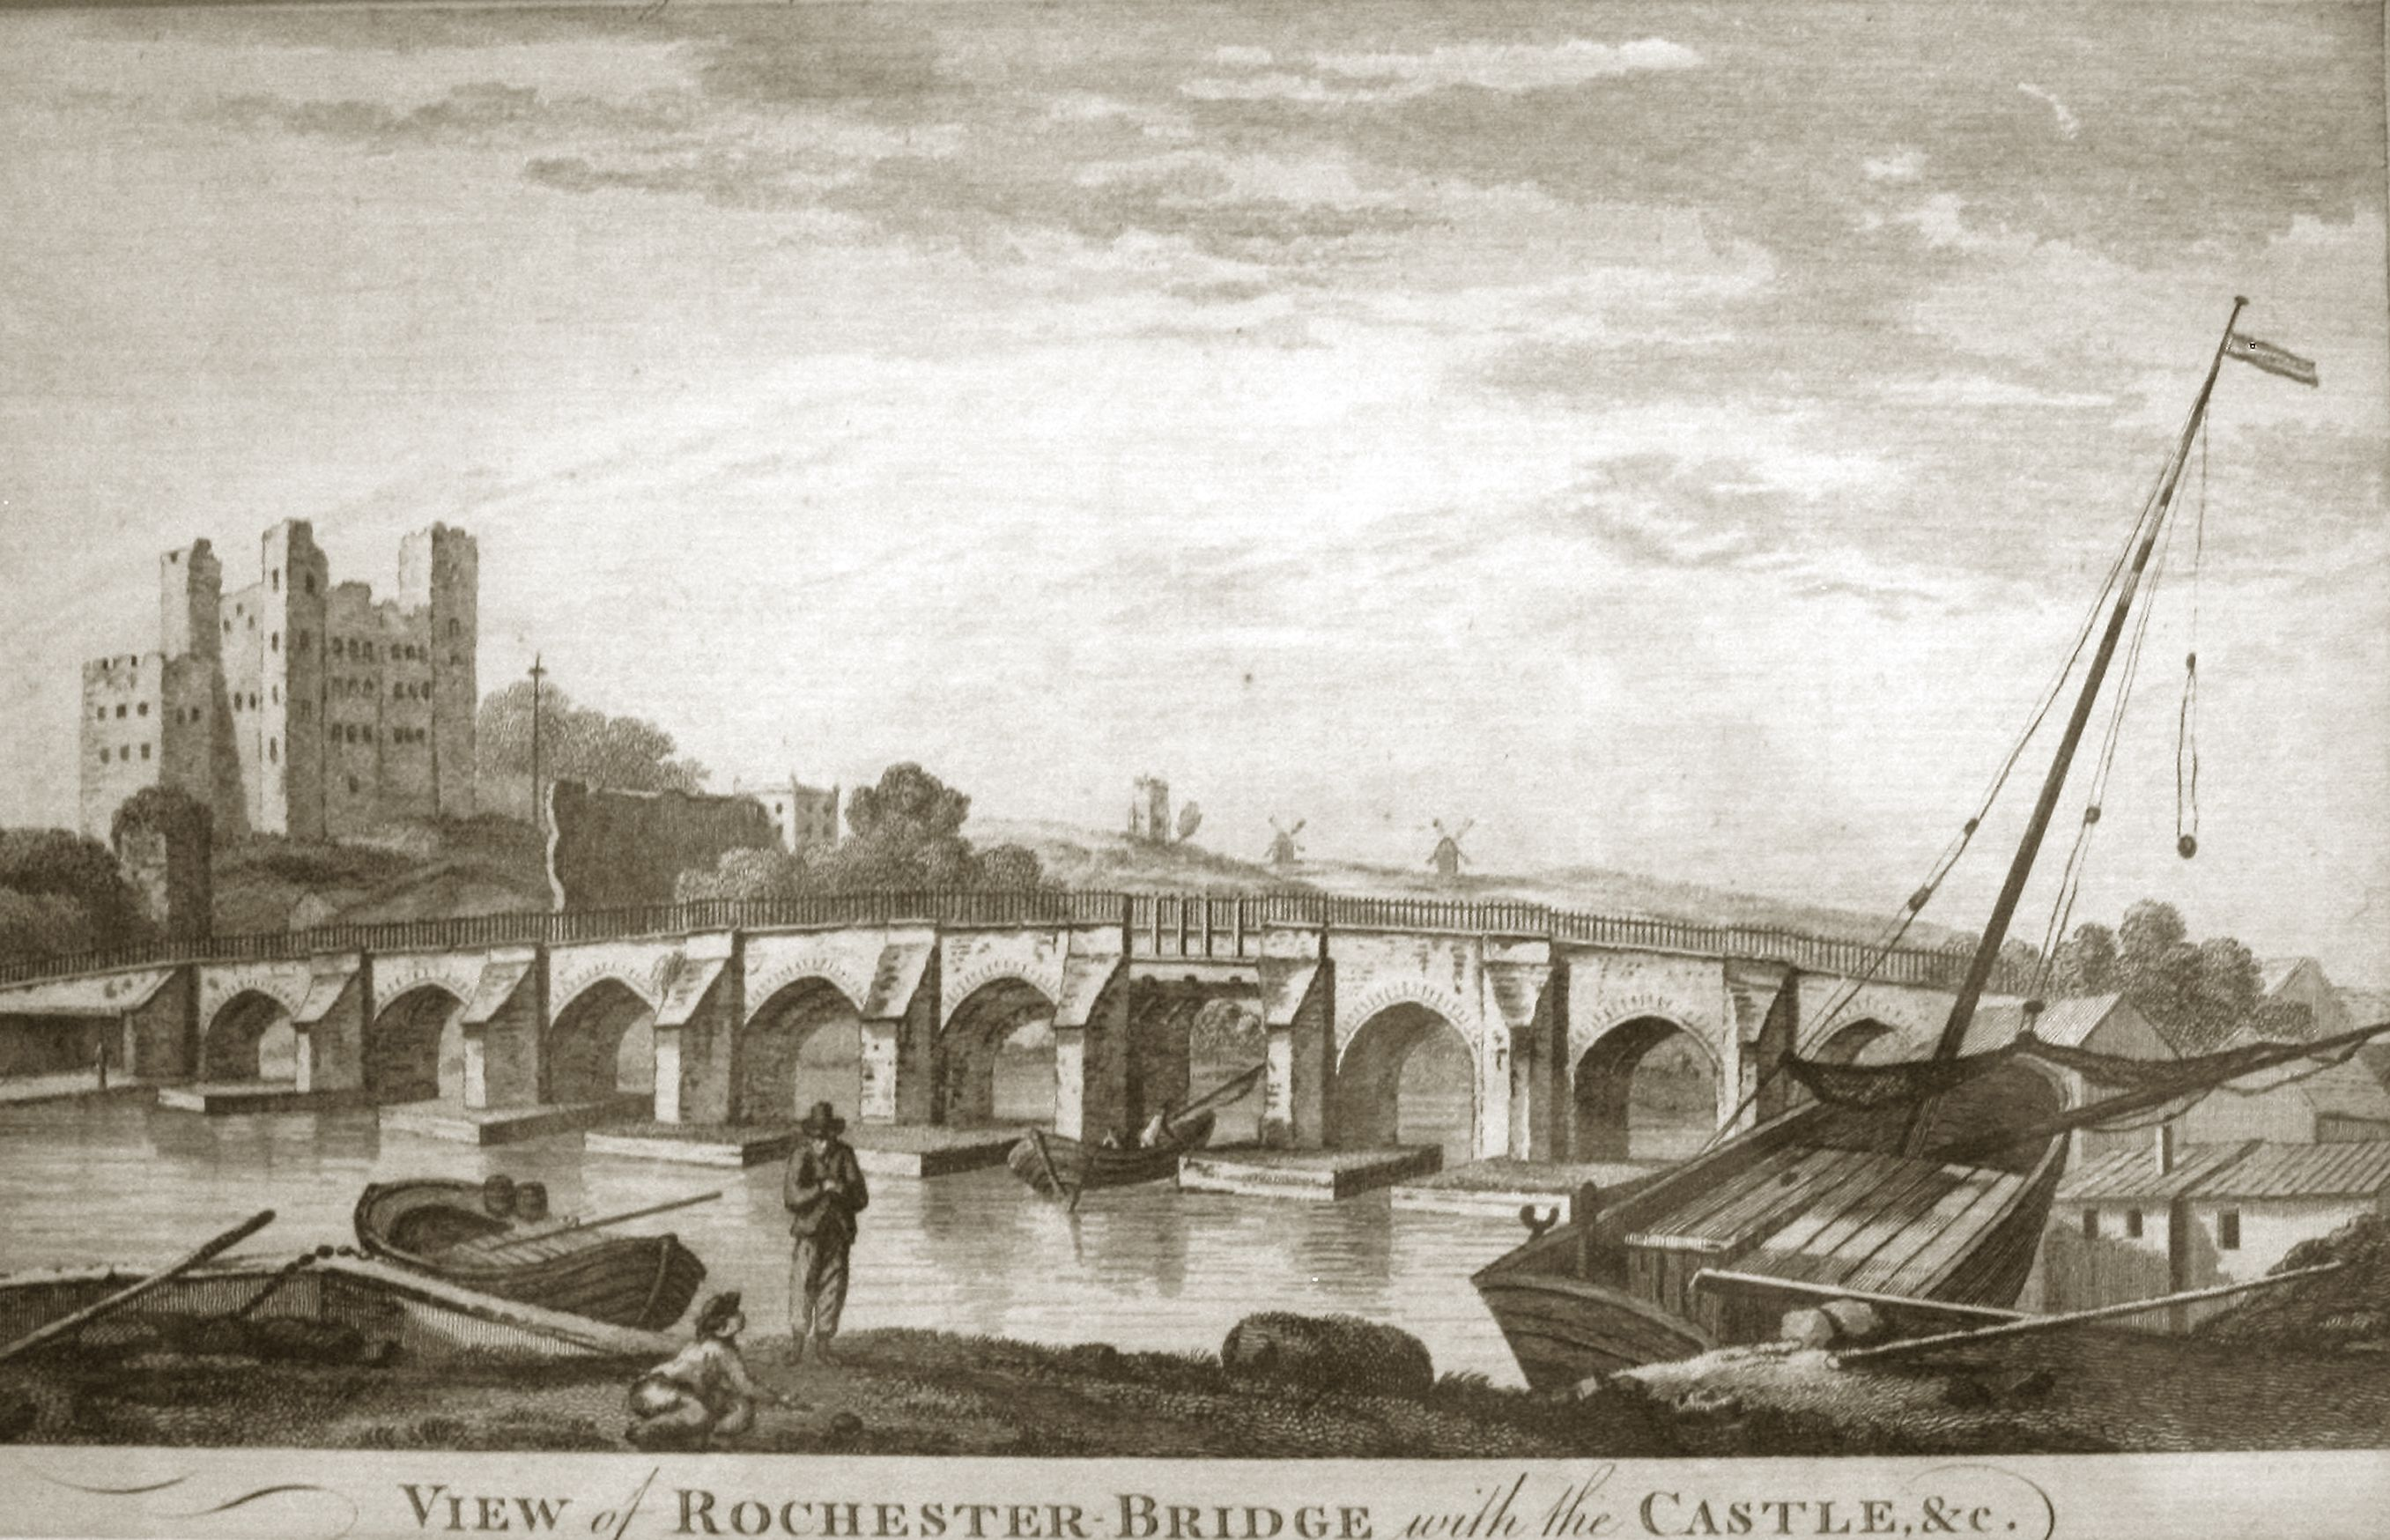 The Rochester Bridge Trust rochesterbridge on Pinterest